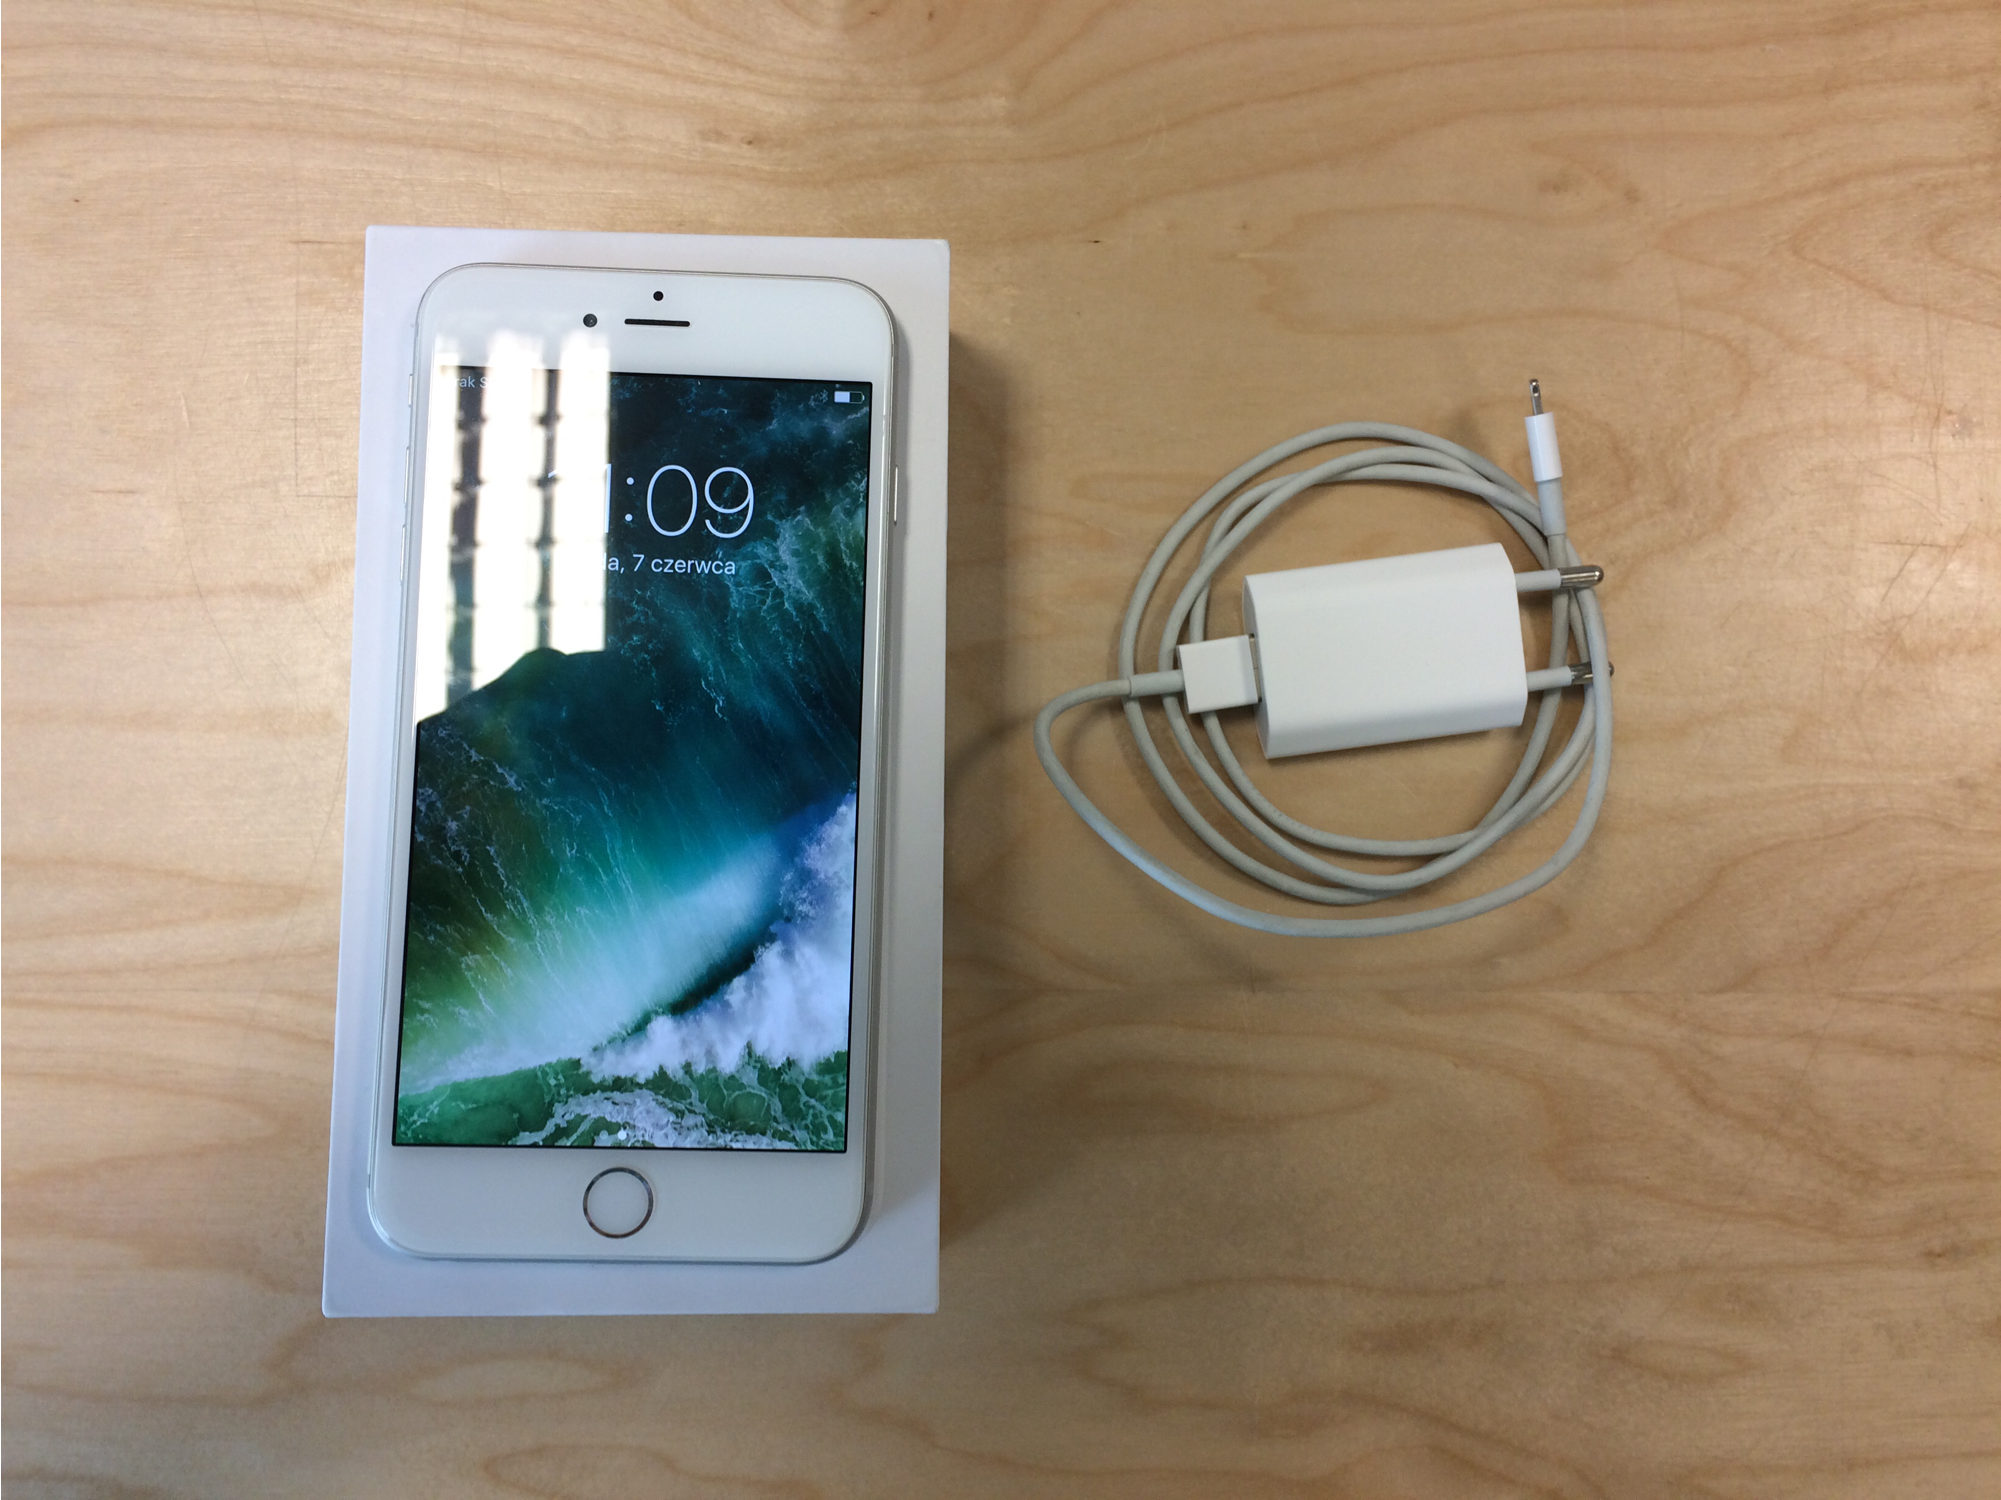 iPhone 6 Plus 64GB, 64GB, Silver, Afbeelding 2